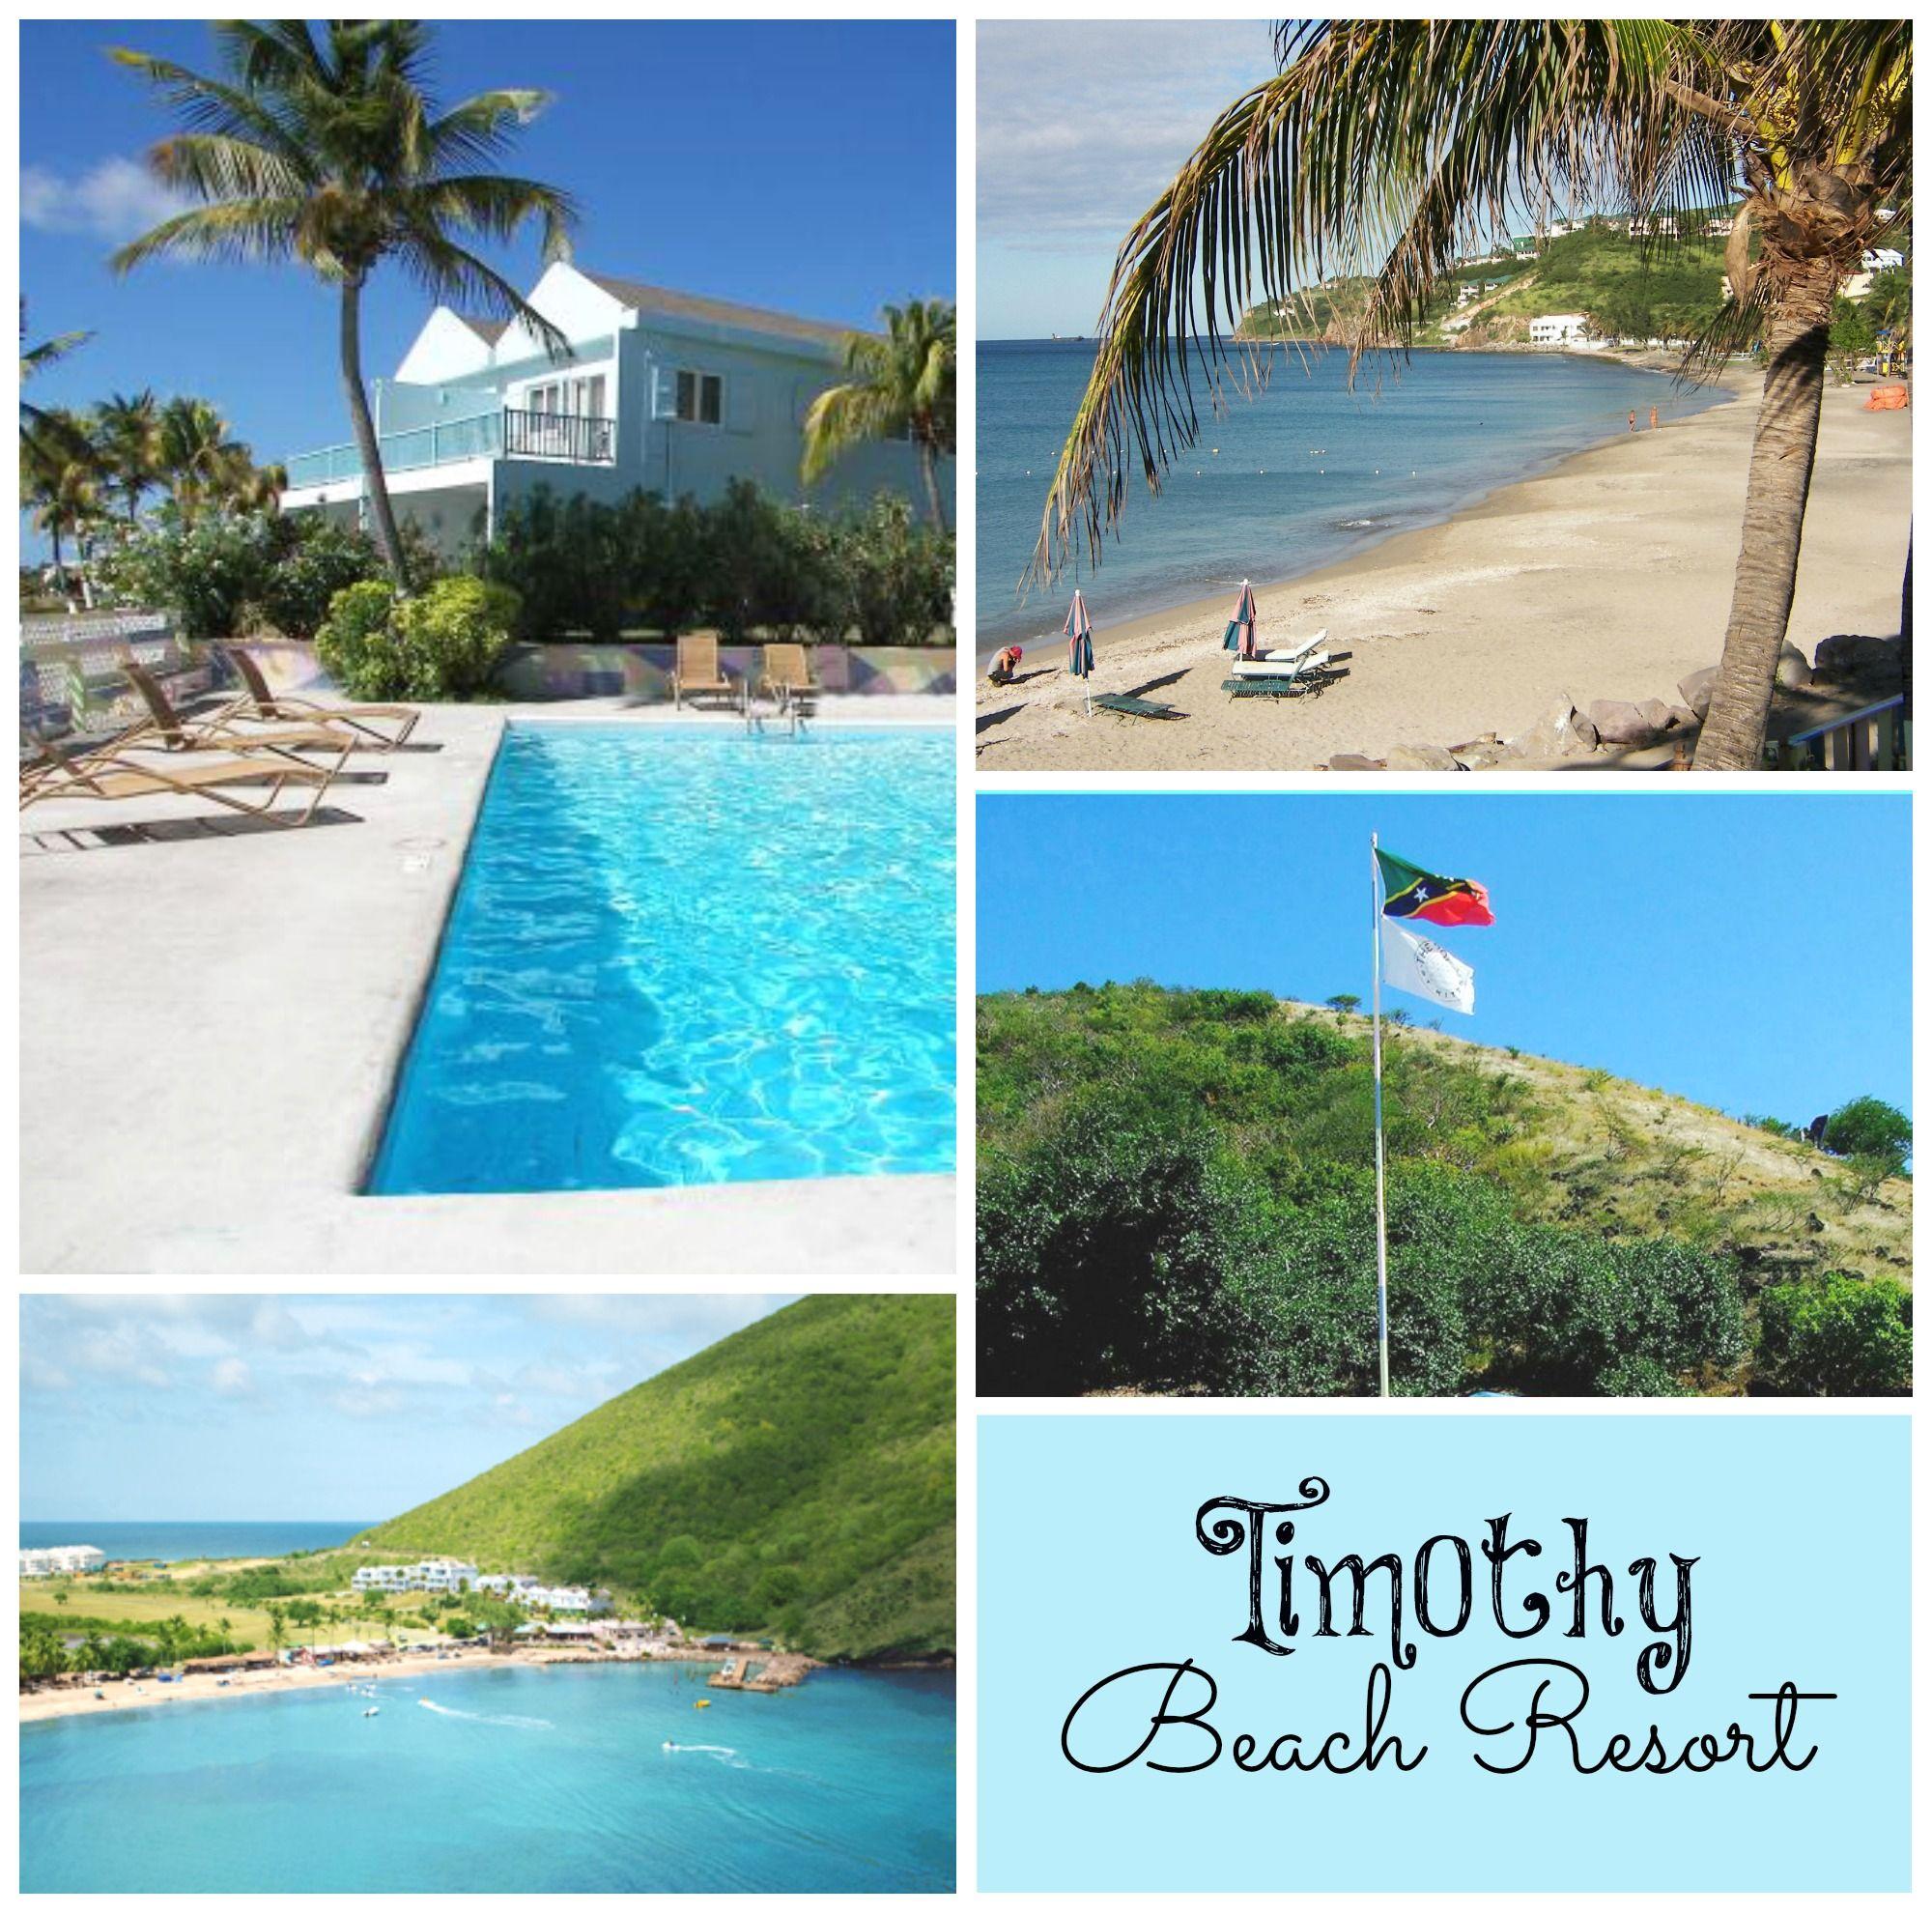 Timothy beach resort st kitts